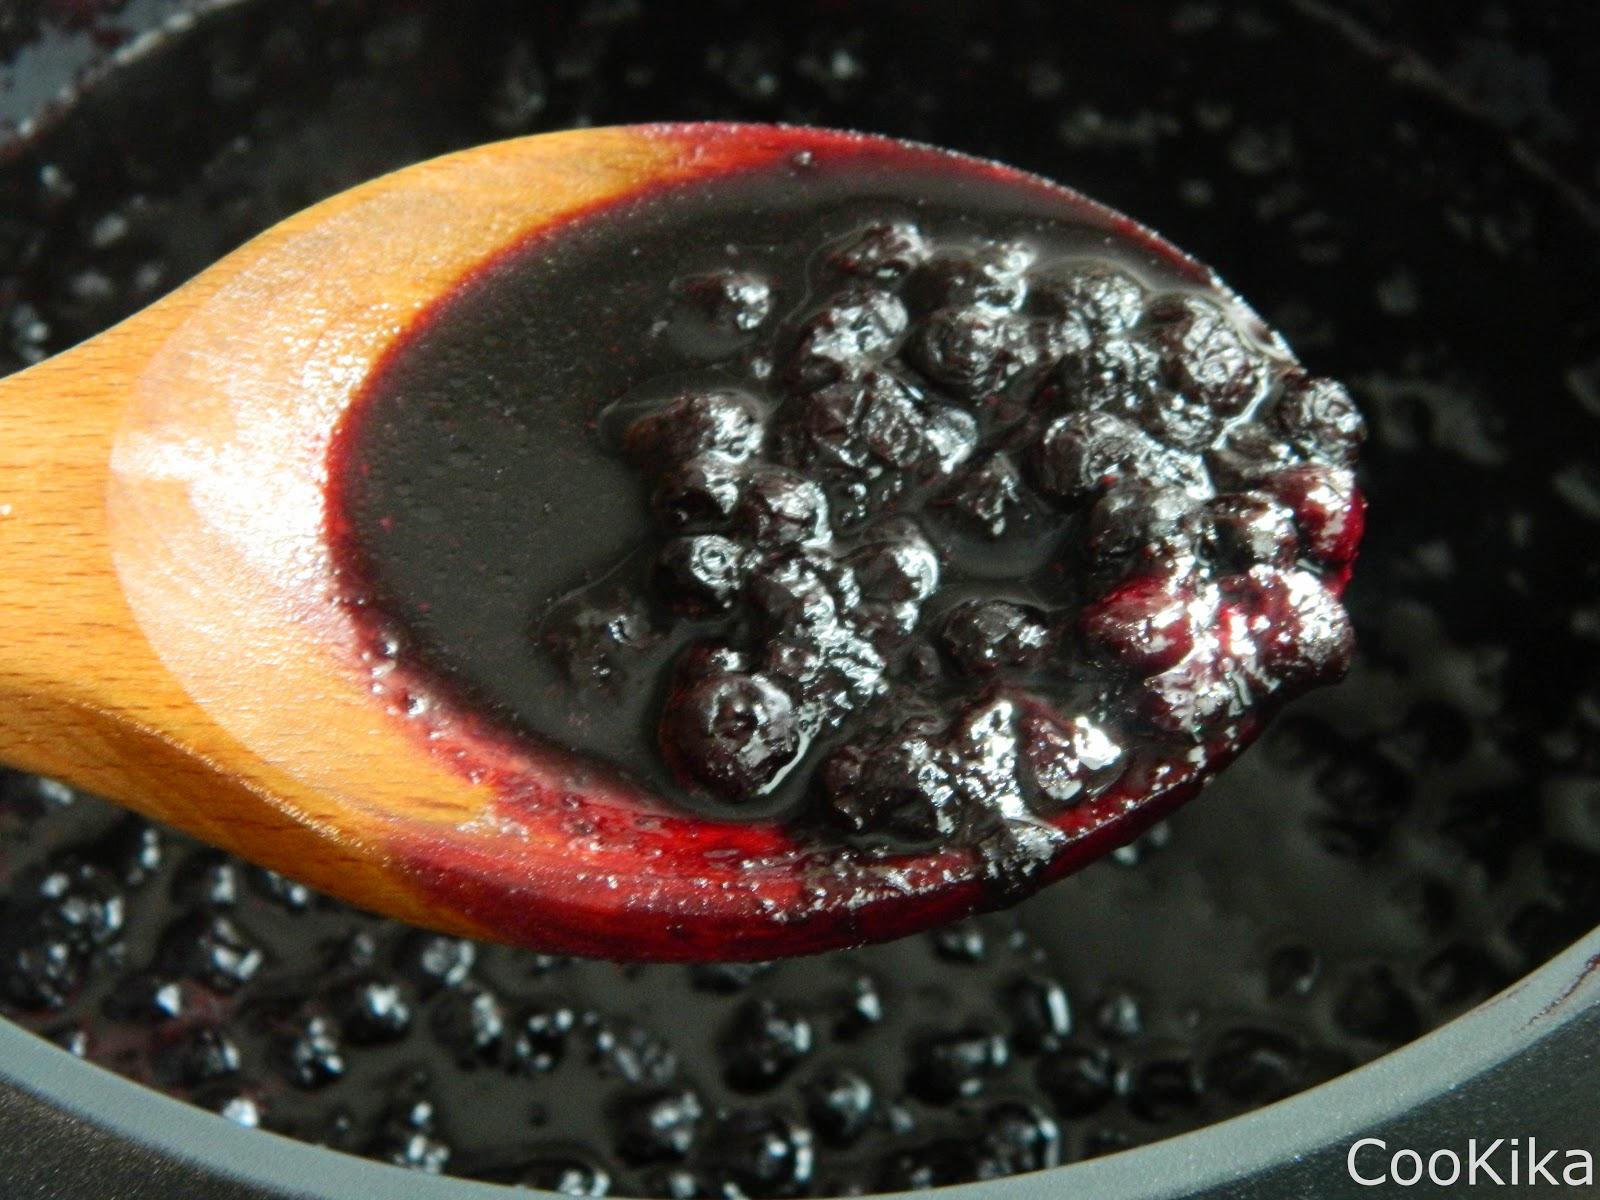 Blueberry jam chia seeds